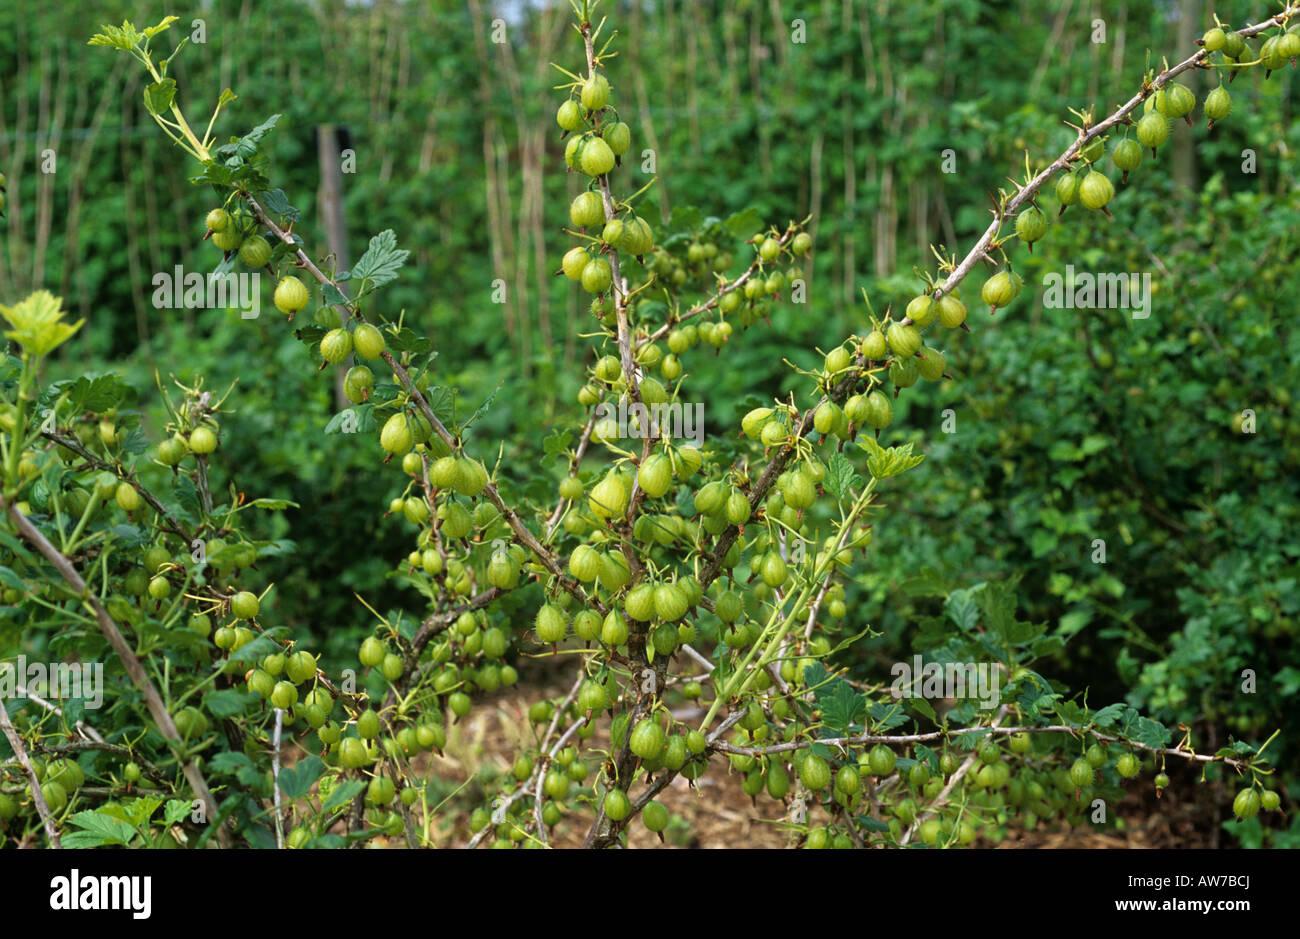 Severe defoliation caused by gooseberry sawfly Nematus ribesii larvae feeding - Stock Image